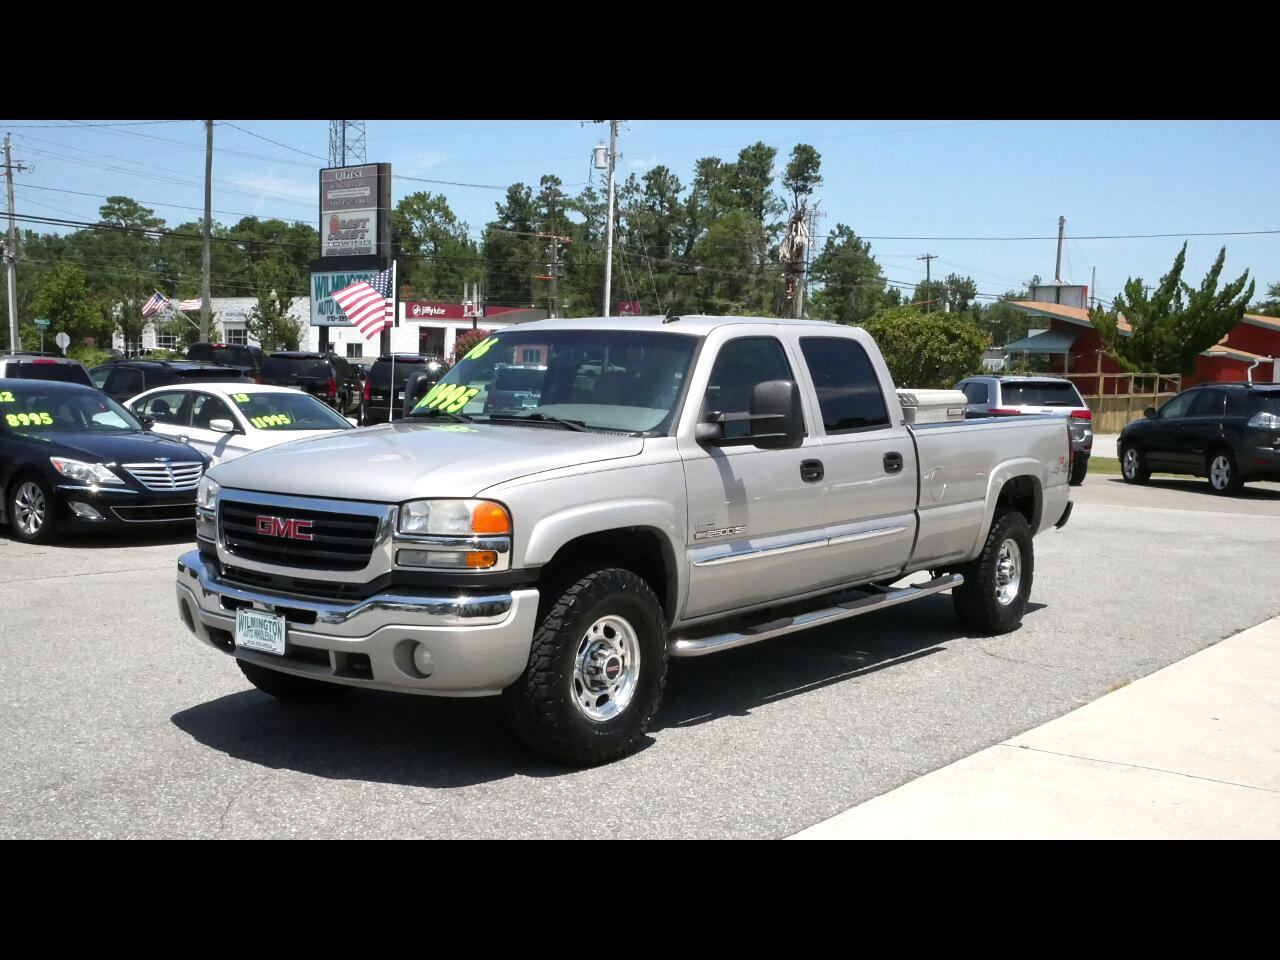 2006 GMC Sierra 2500HD Work Truck Crew Cab Long Bed 4WD